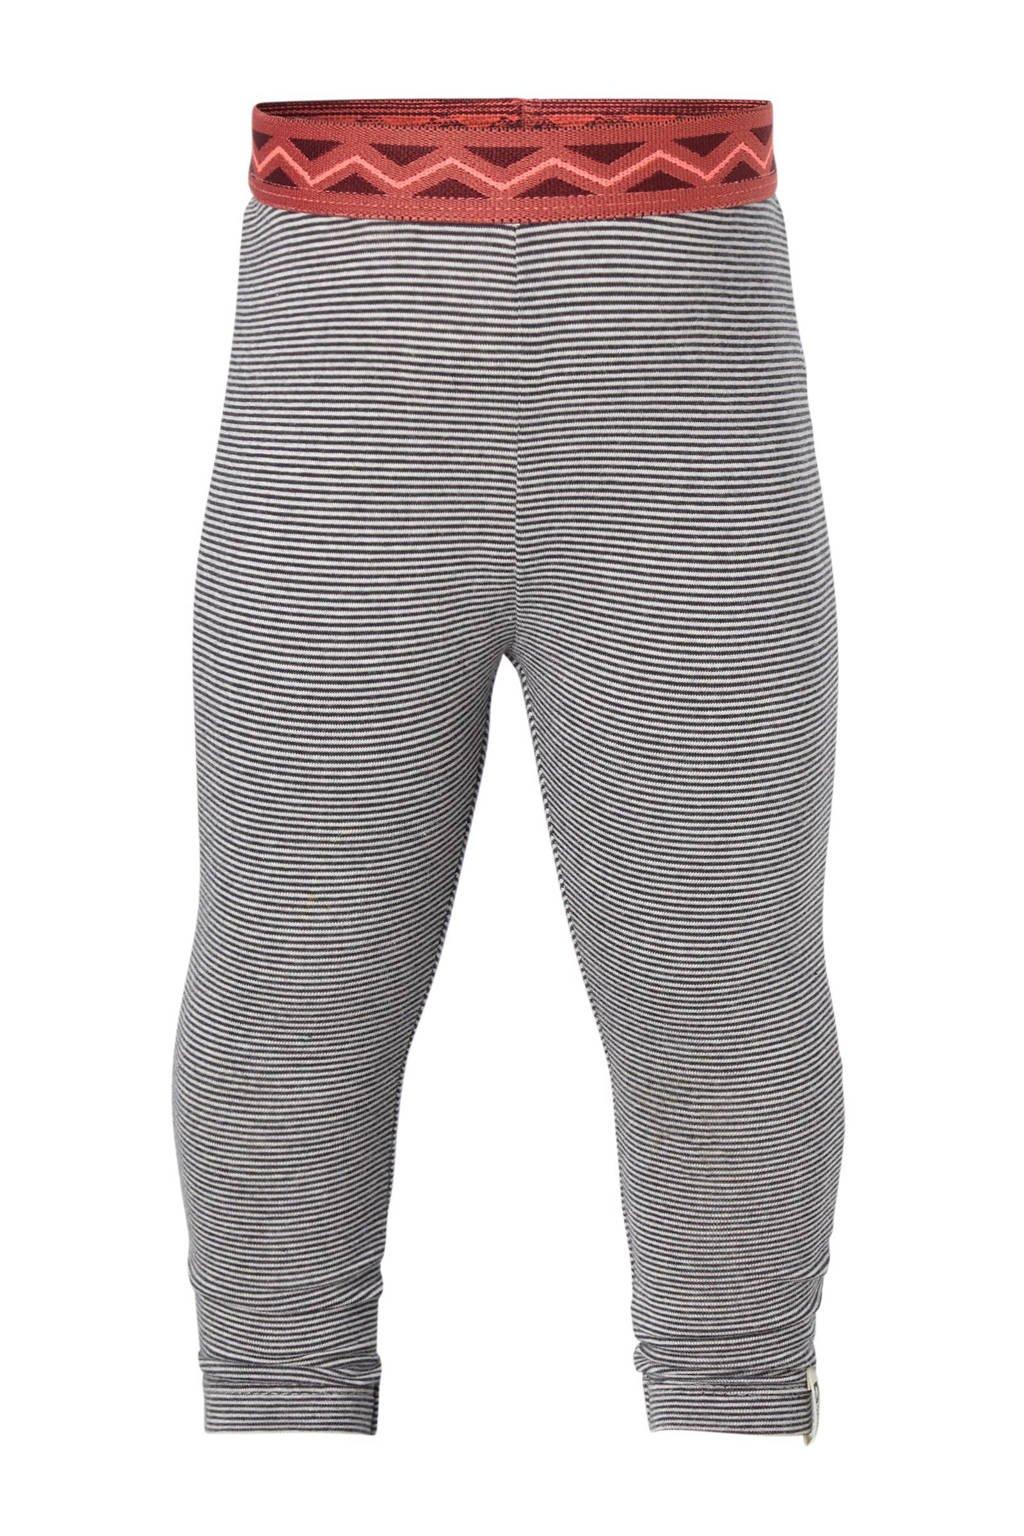 Tumble 'n Dry Lo gestreepte legging, Wit/zwart/roze